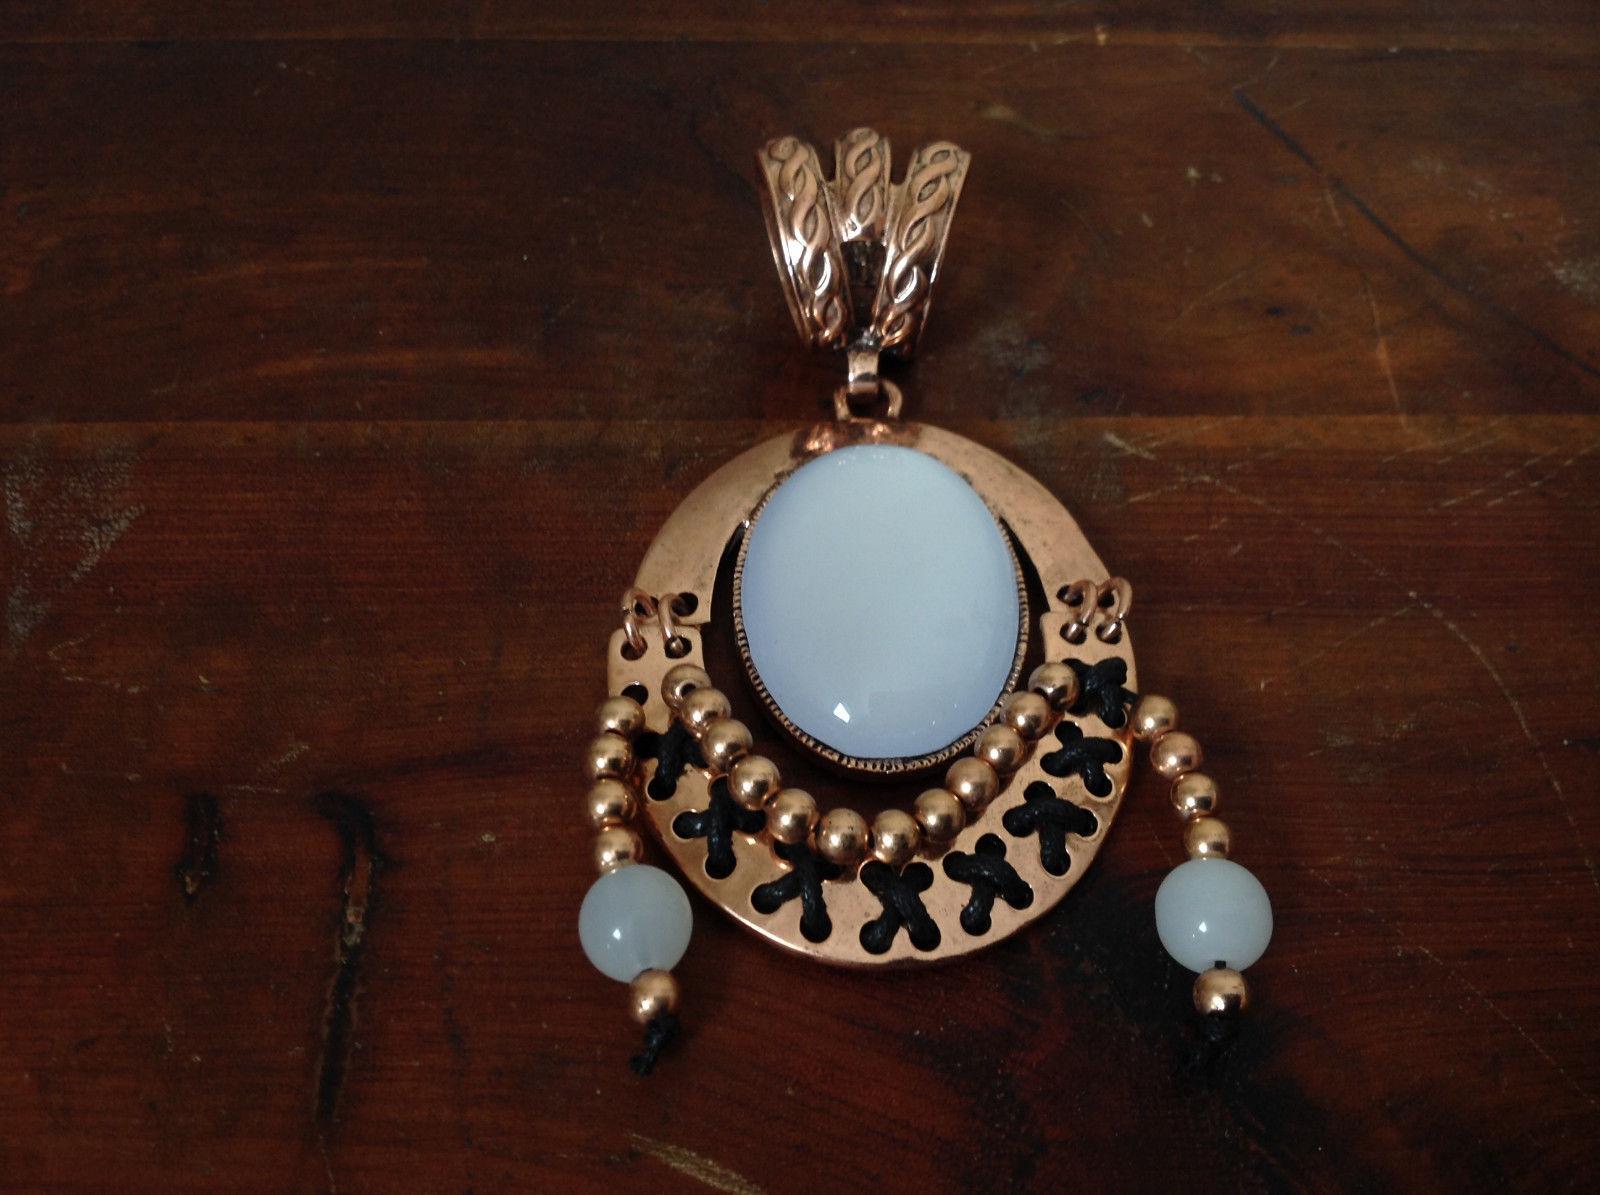 Elegant Bronze Tone Vintage Style Scarf Pendant with Large White Stone and Beads